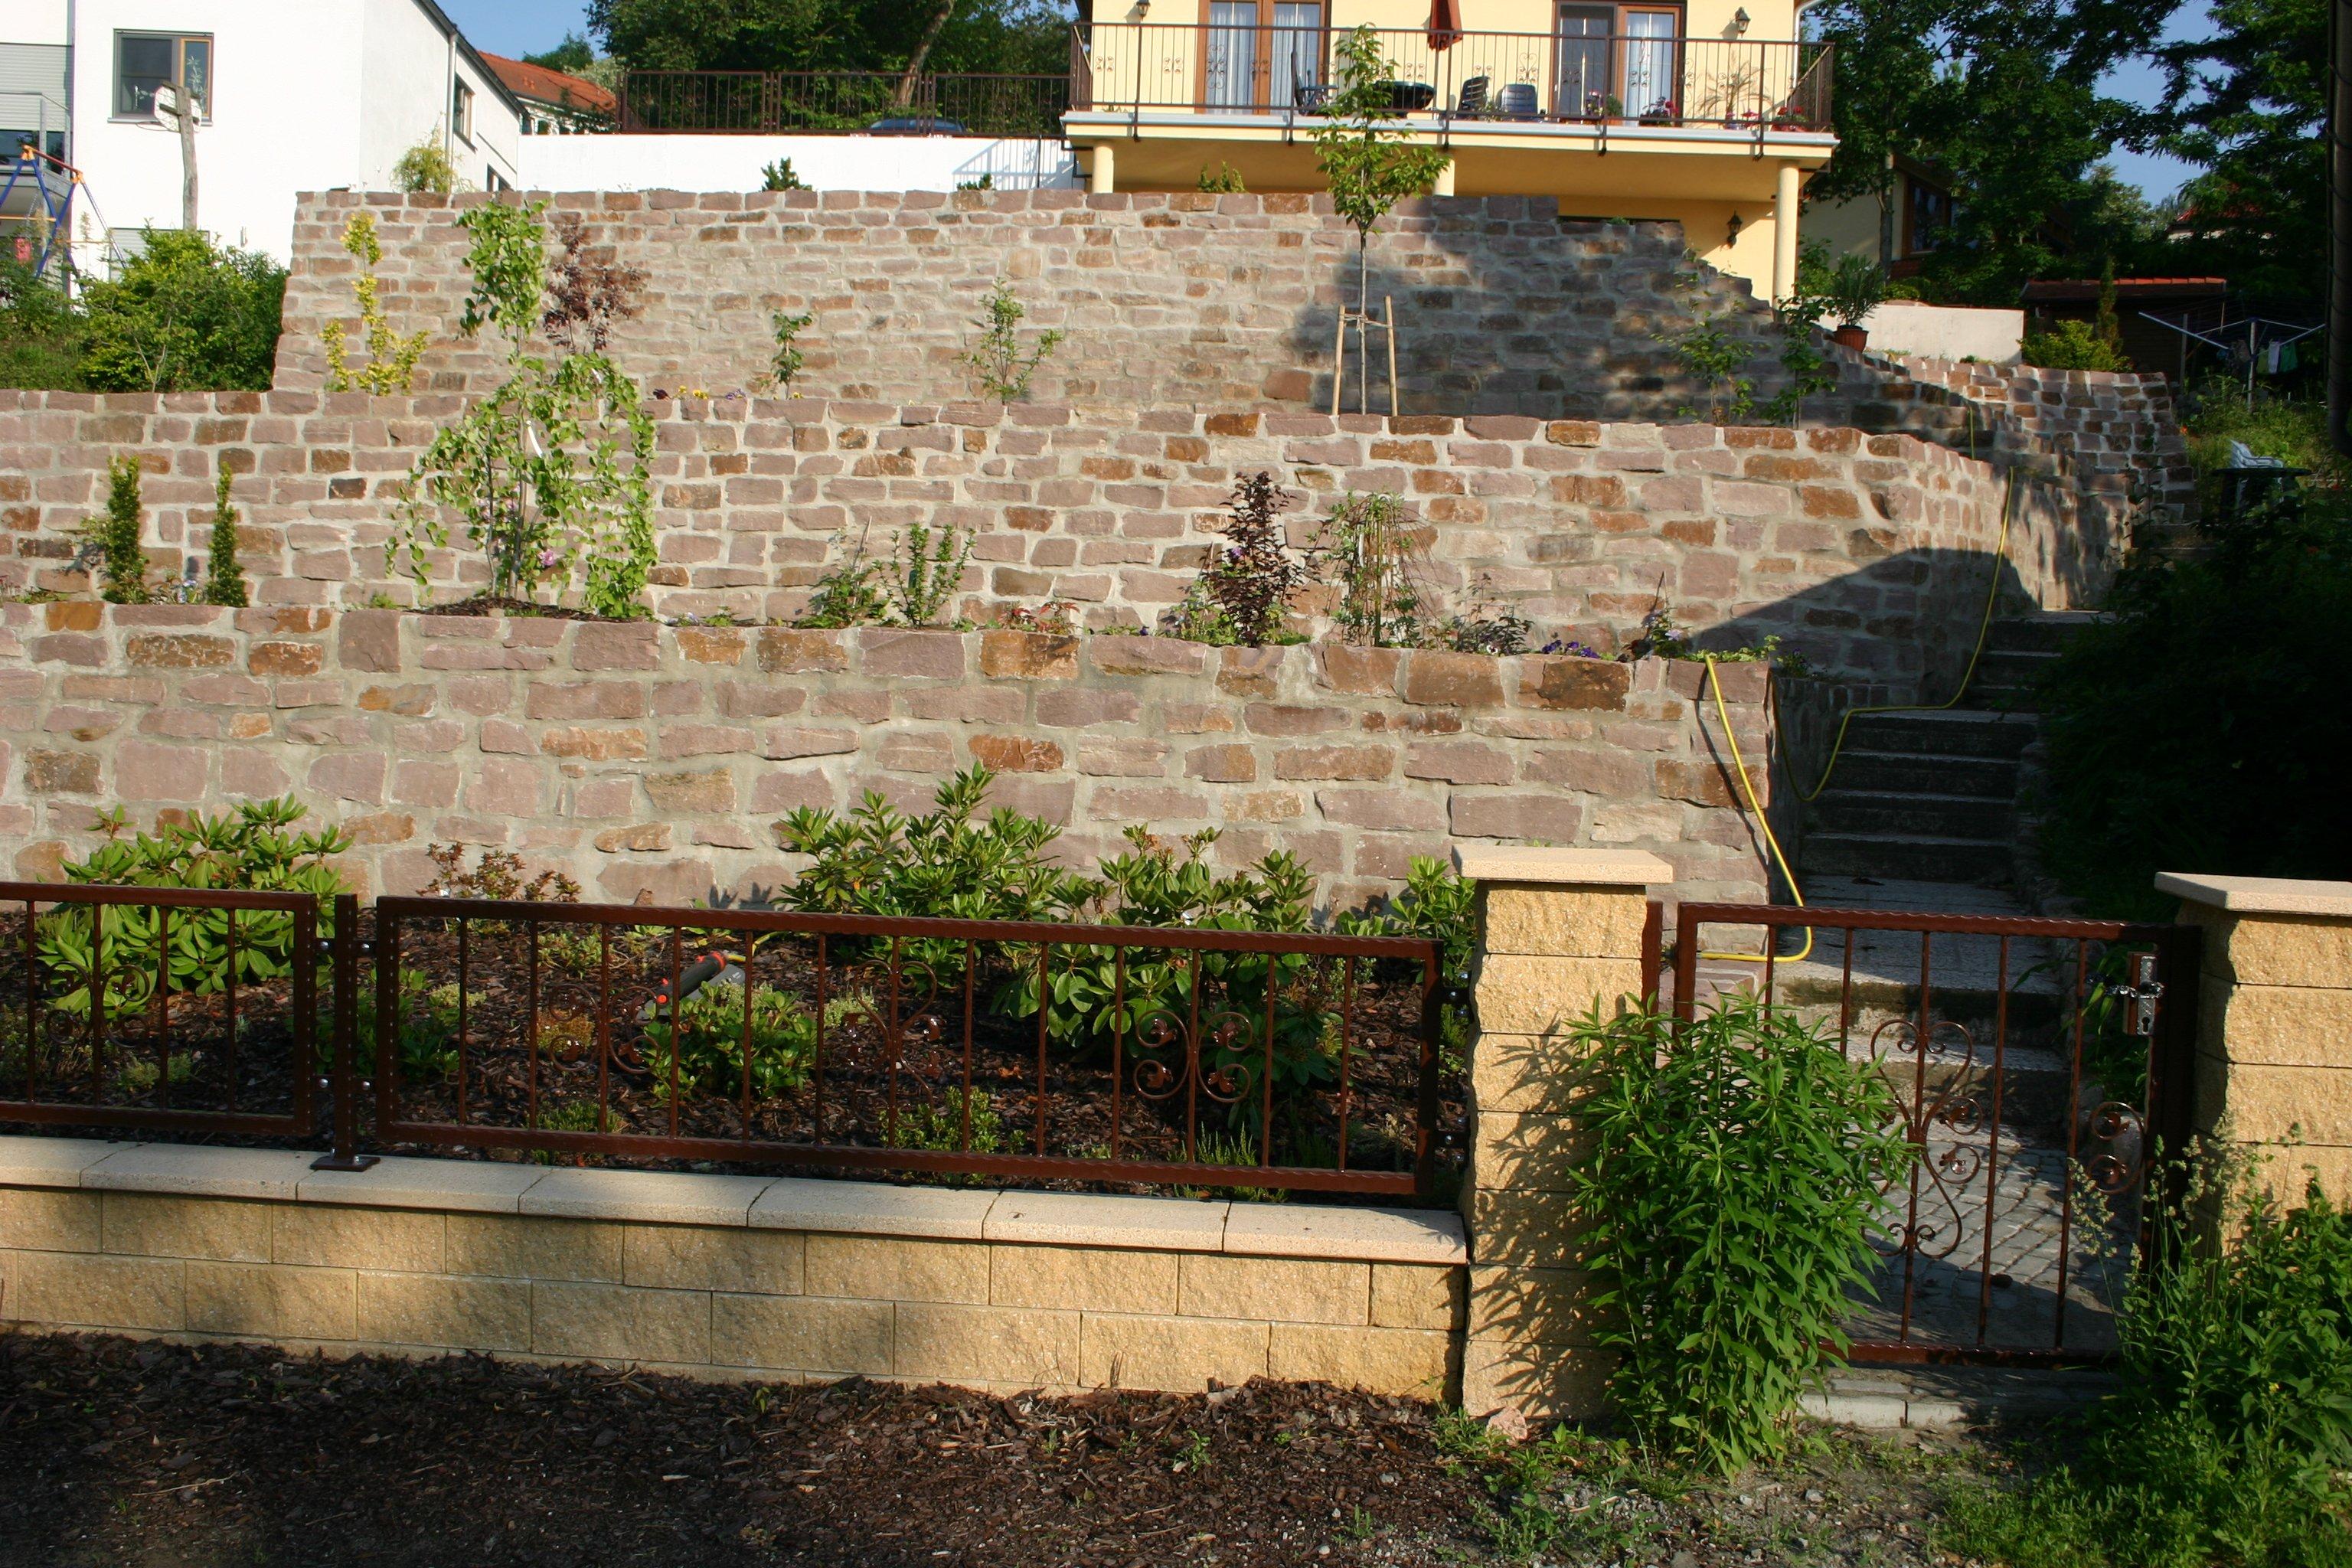 terrasse und wege mit bangkirai holz hess bau gmbh. Black Bedroom Furniture Sets. Home Design Ideas